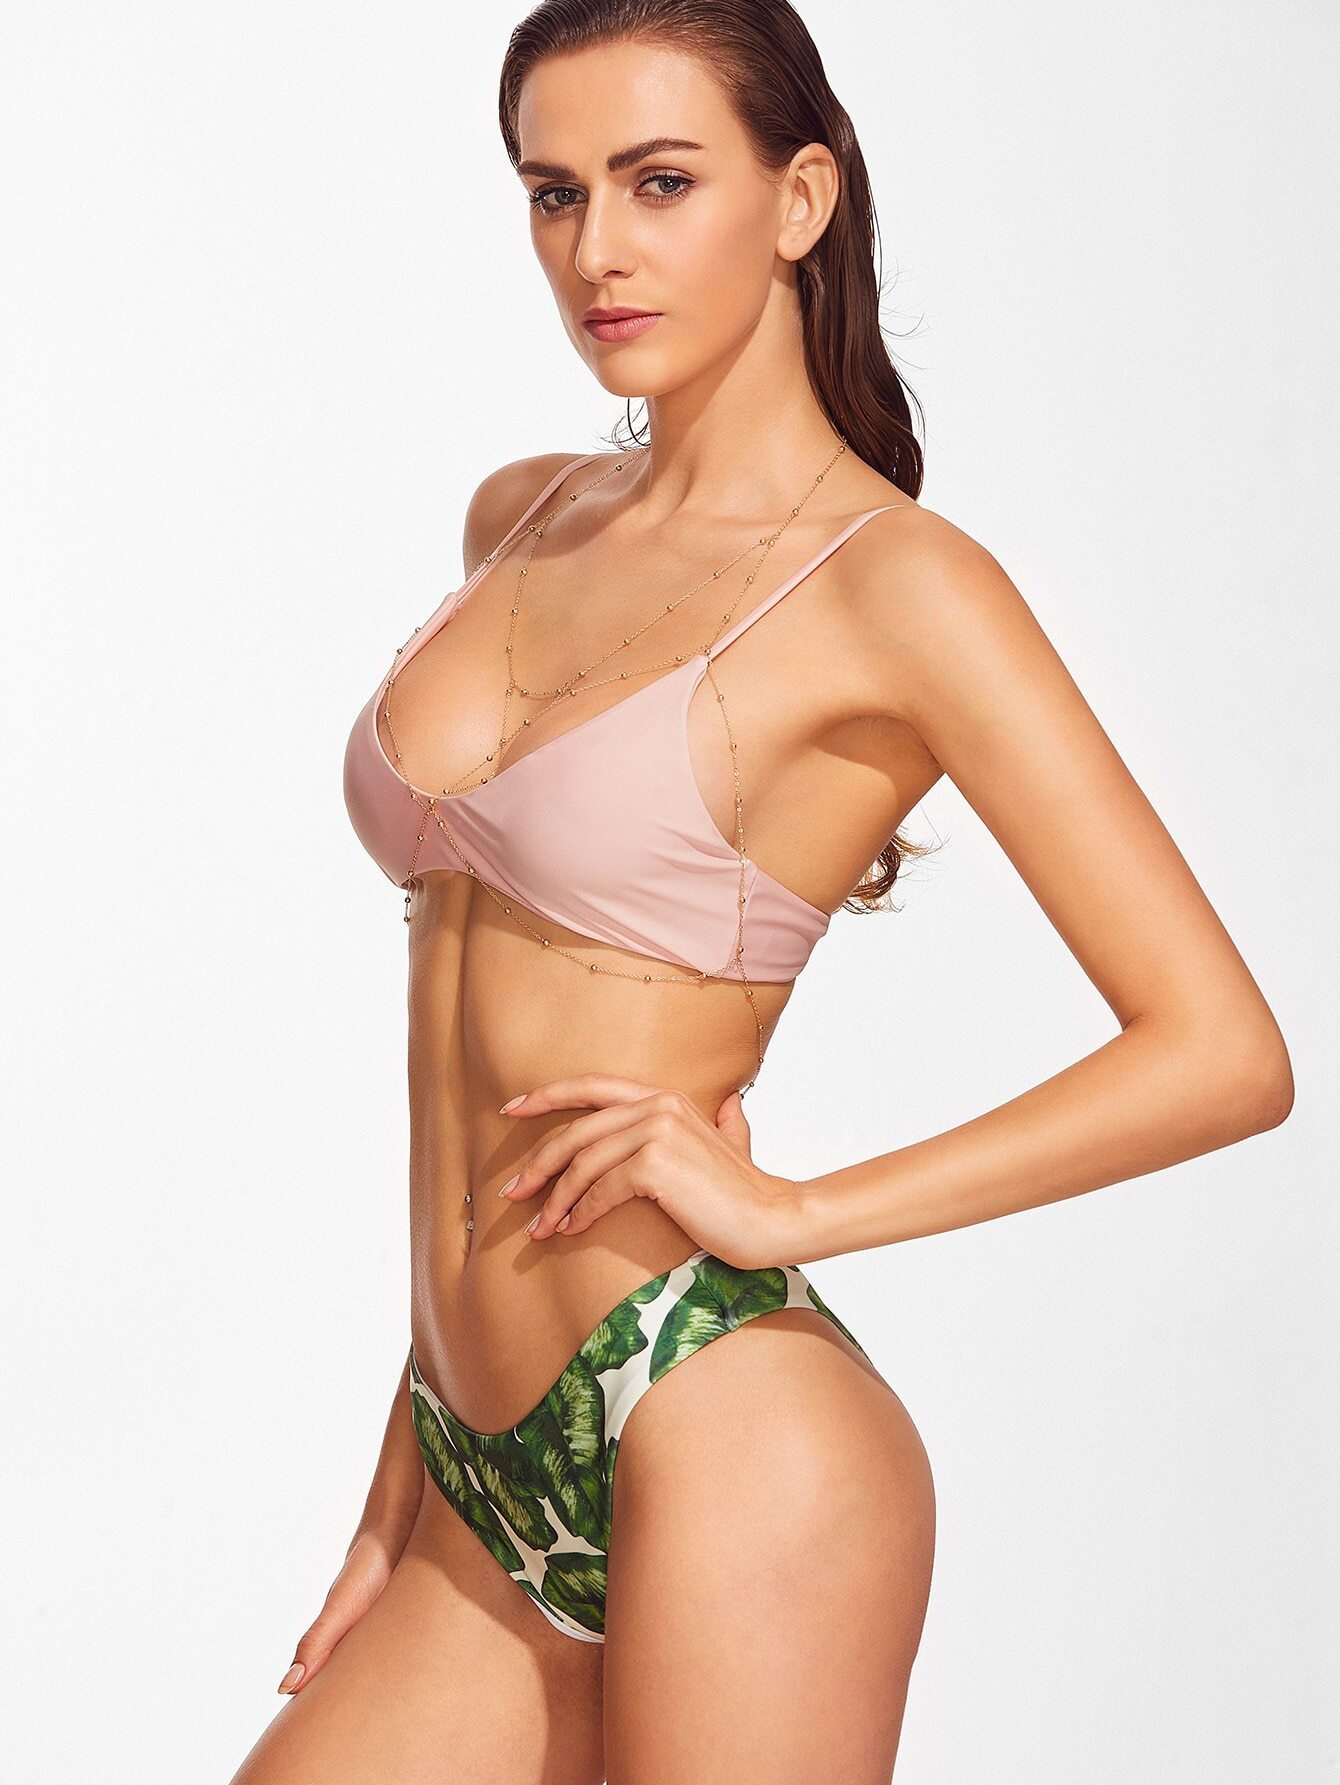 The most sexy bikini